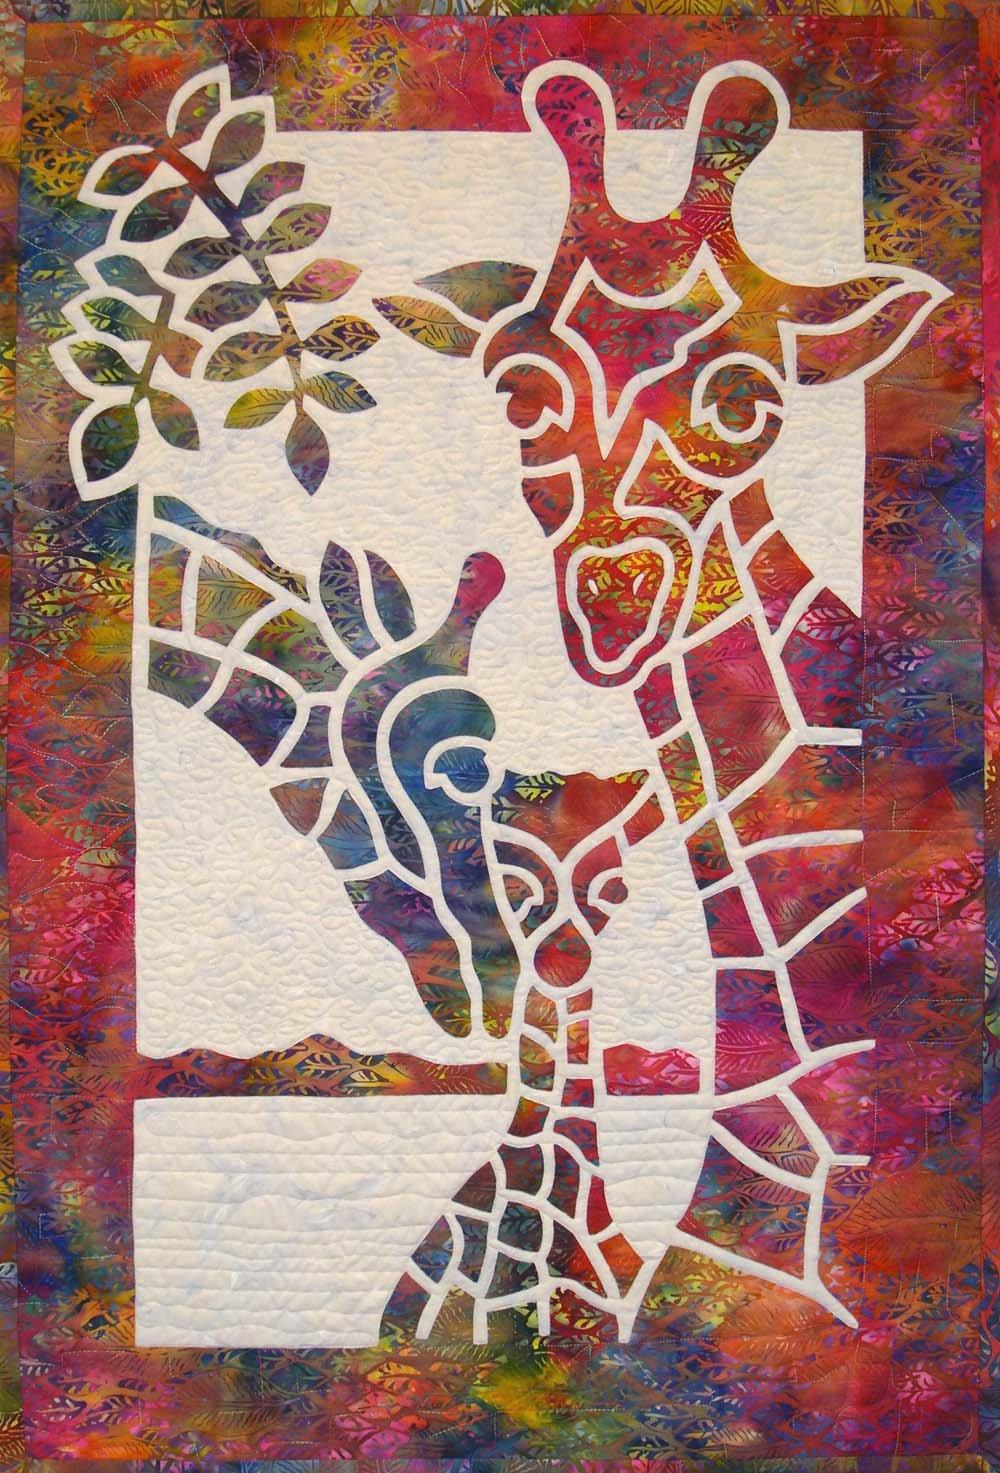 PRQC Giraffe Family